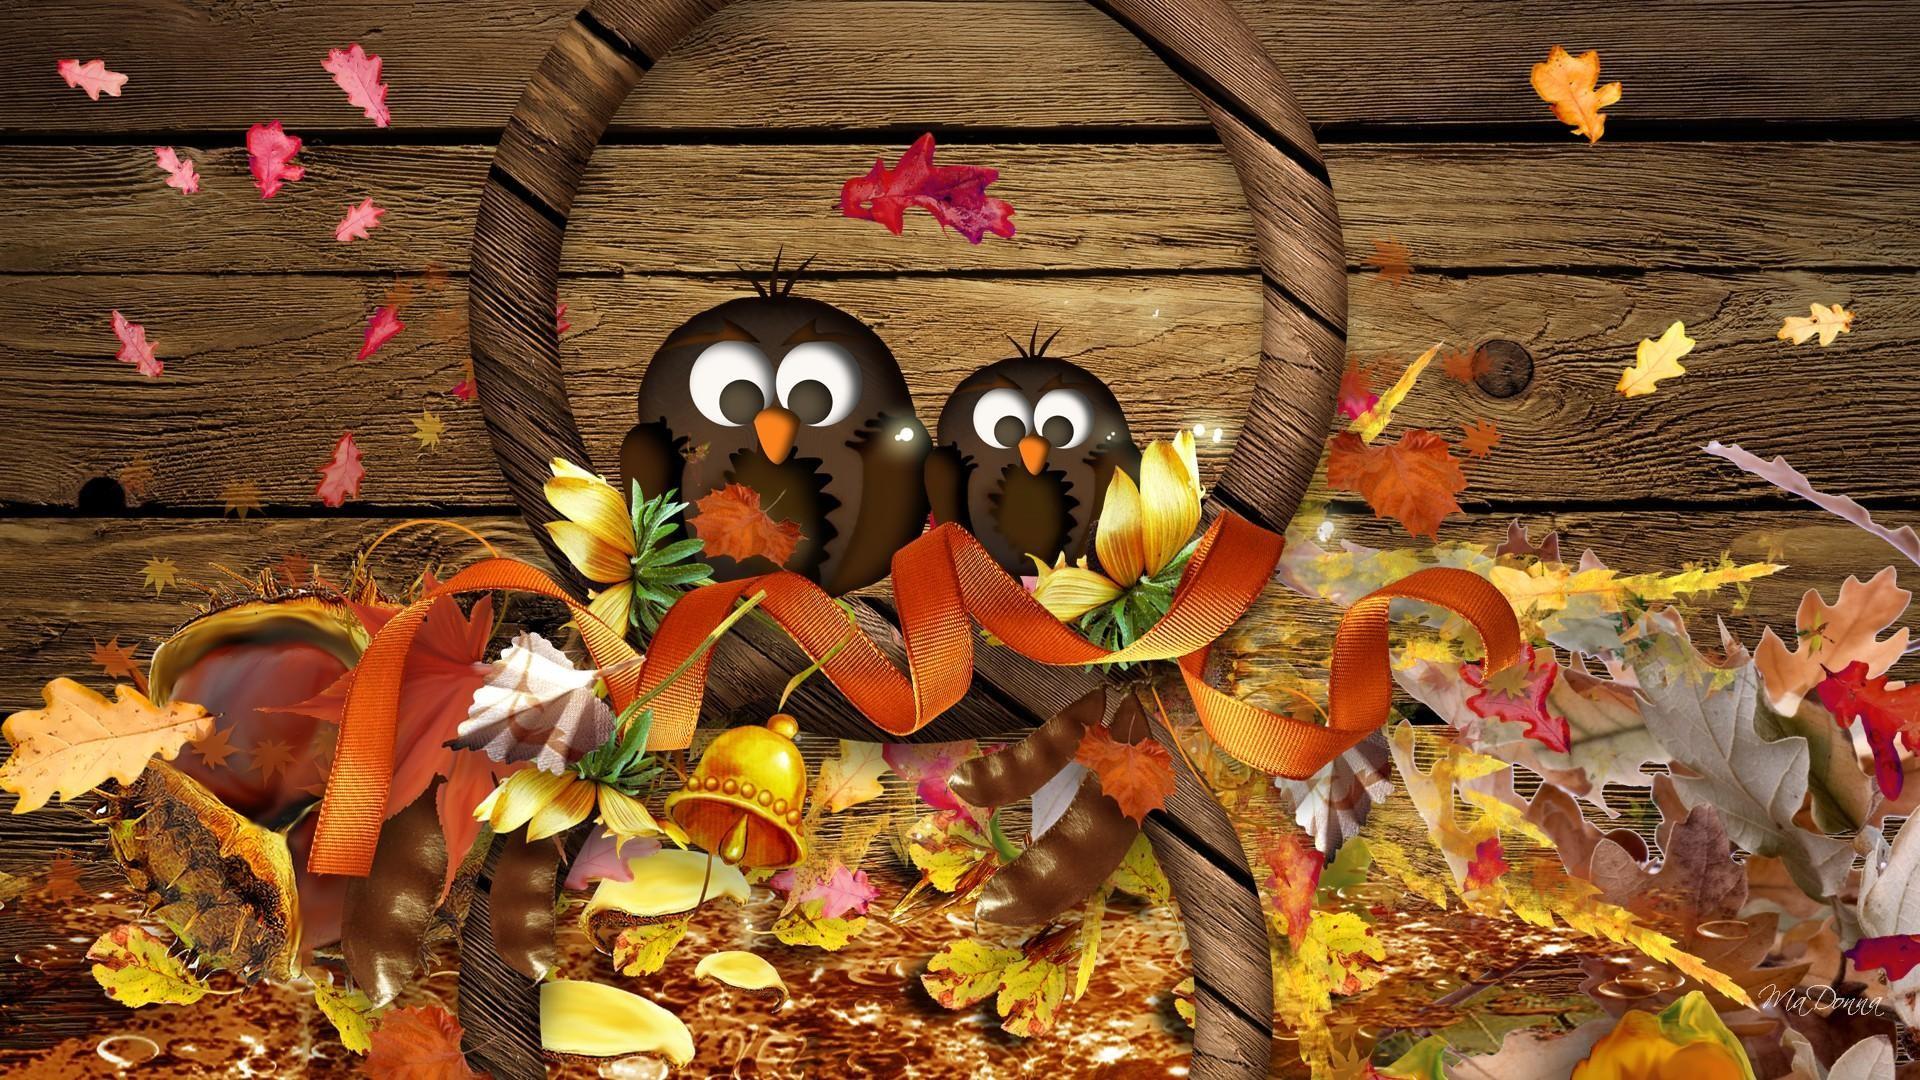 Cute Thanksgiving Screensavers   Thanksgiving HD Desktop Wallpapers for…